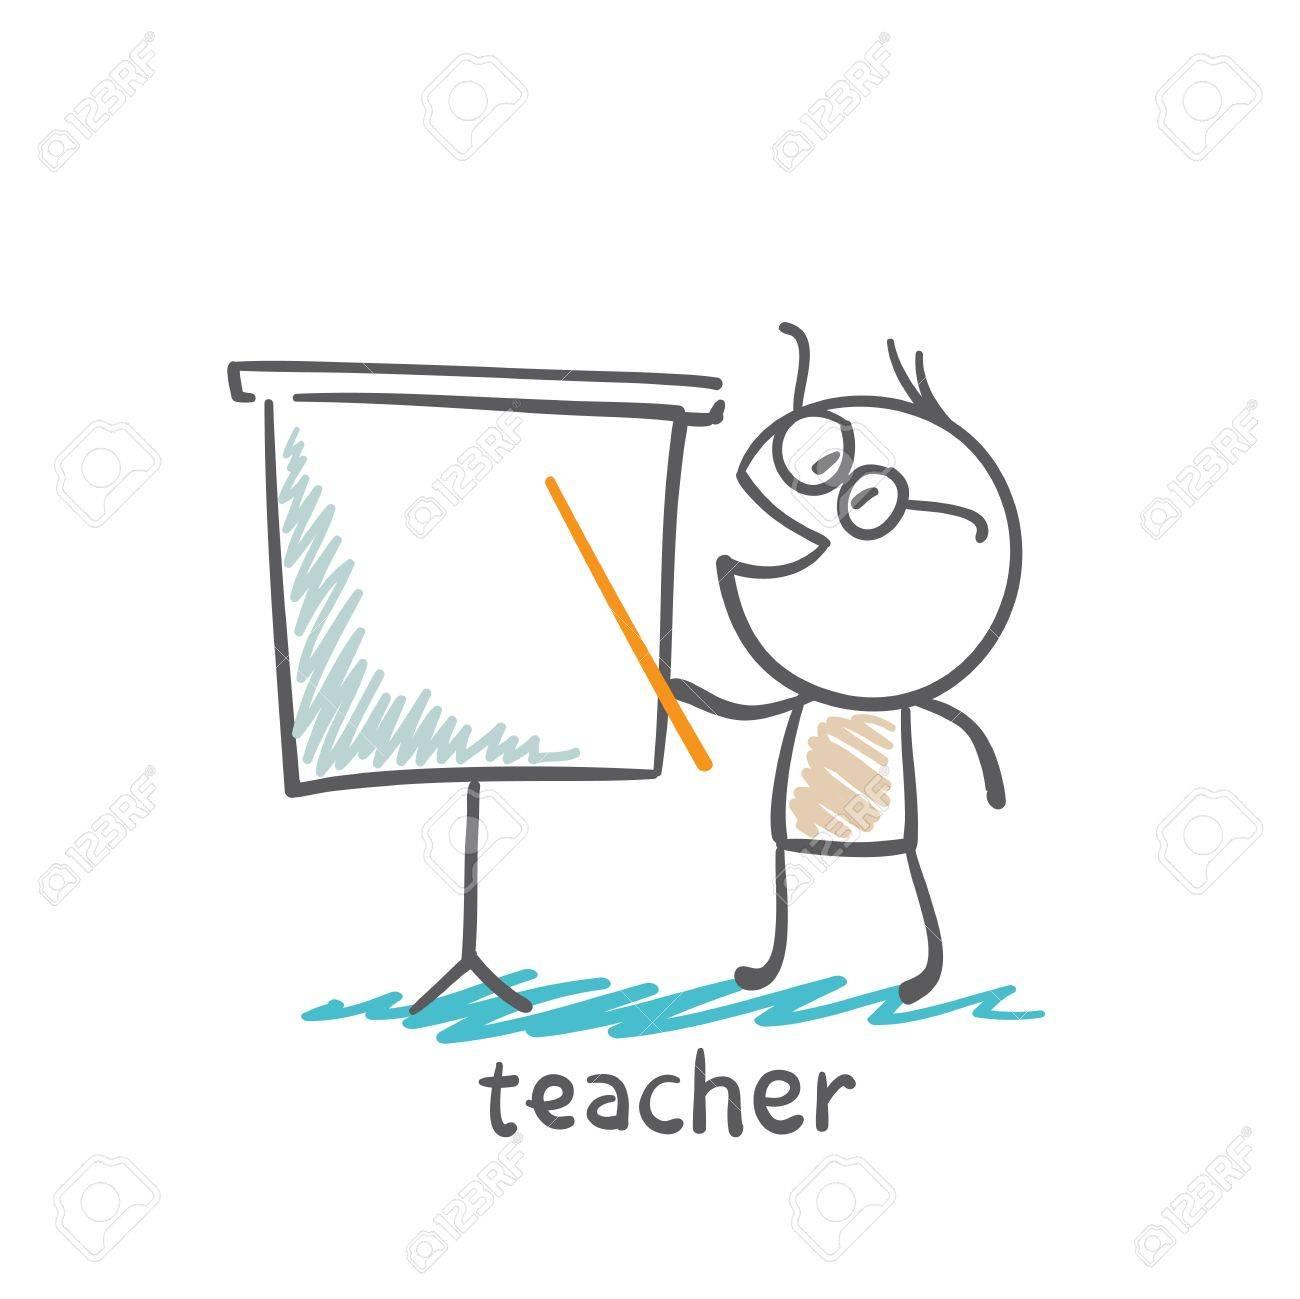 Teacher shows pointer on the board illustration - 36068996